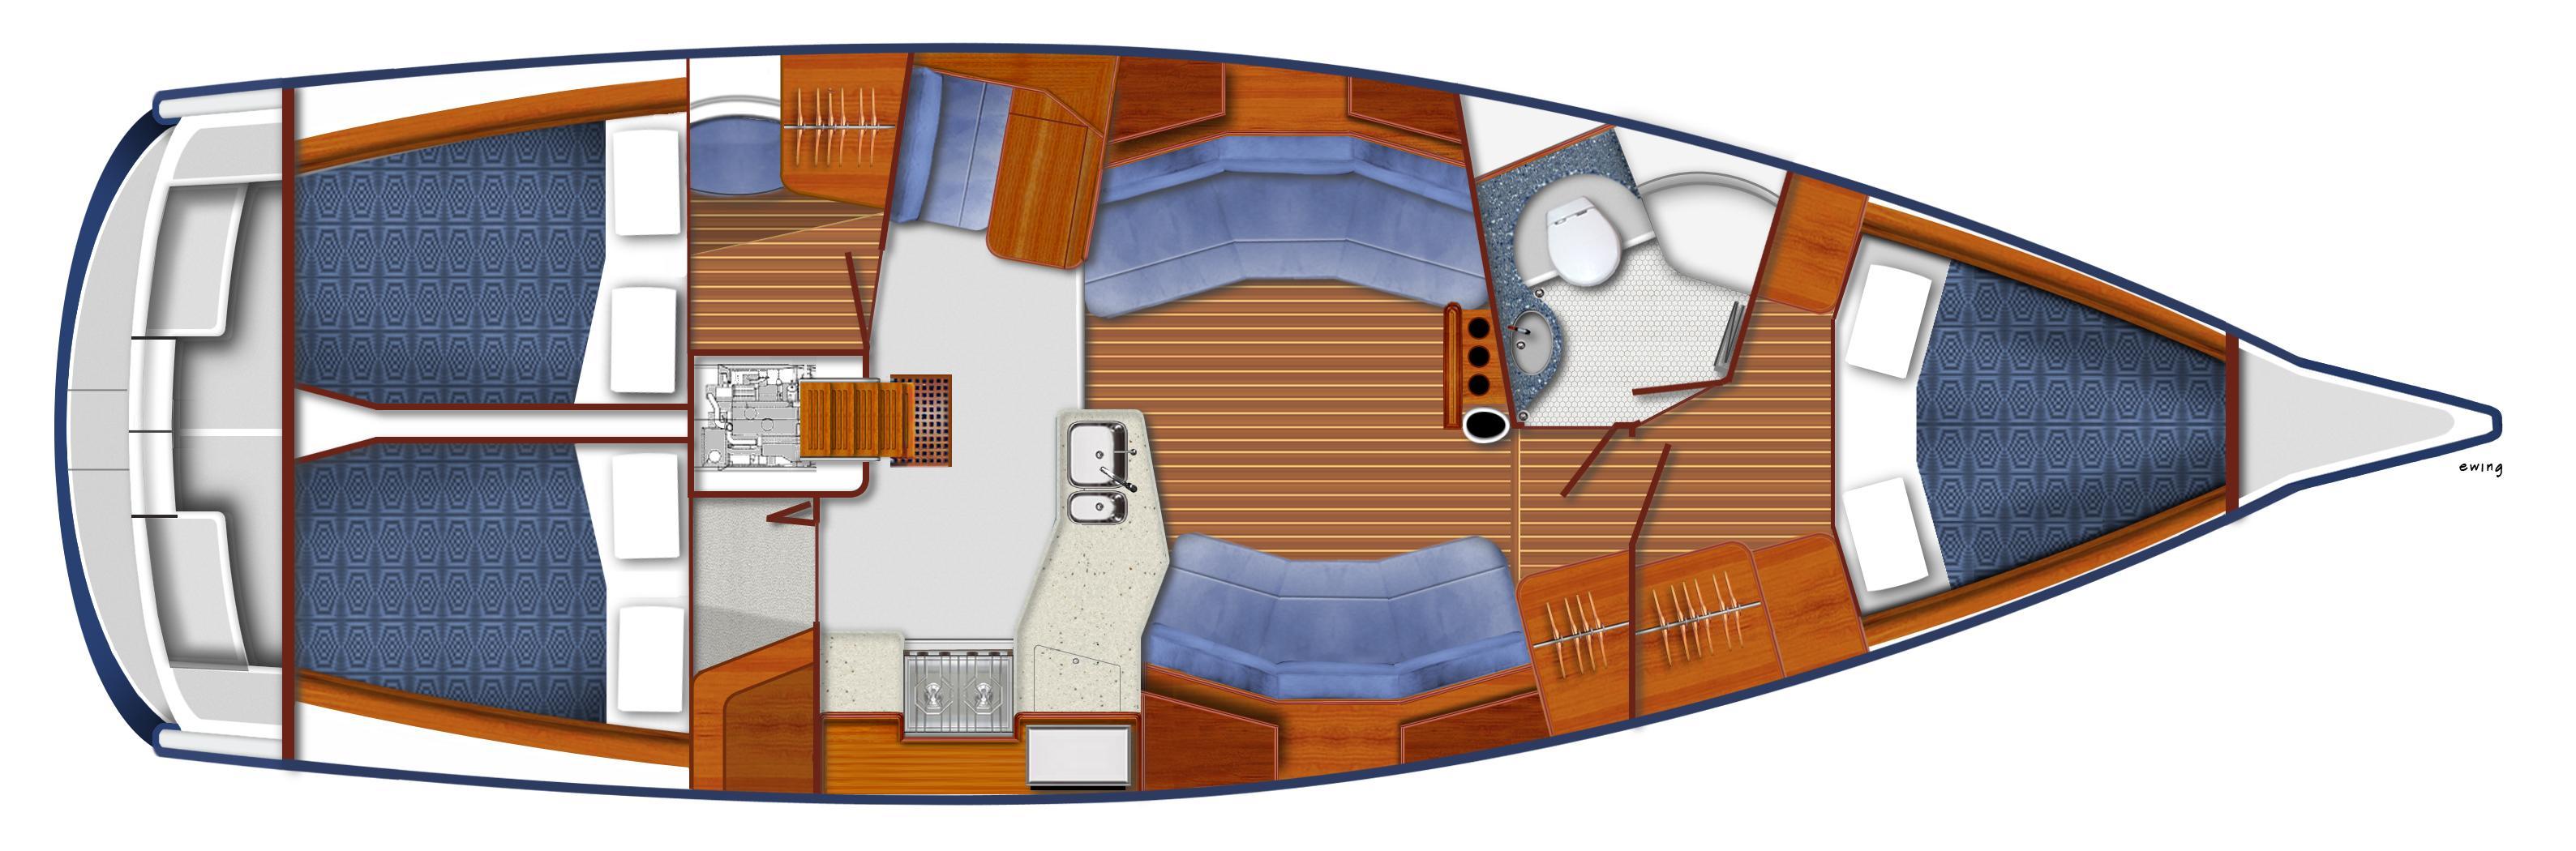 Sleek Hull Design For A Performance Cruiser.